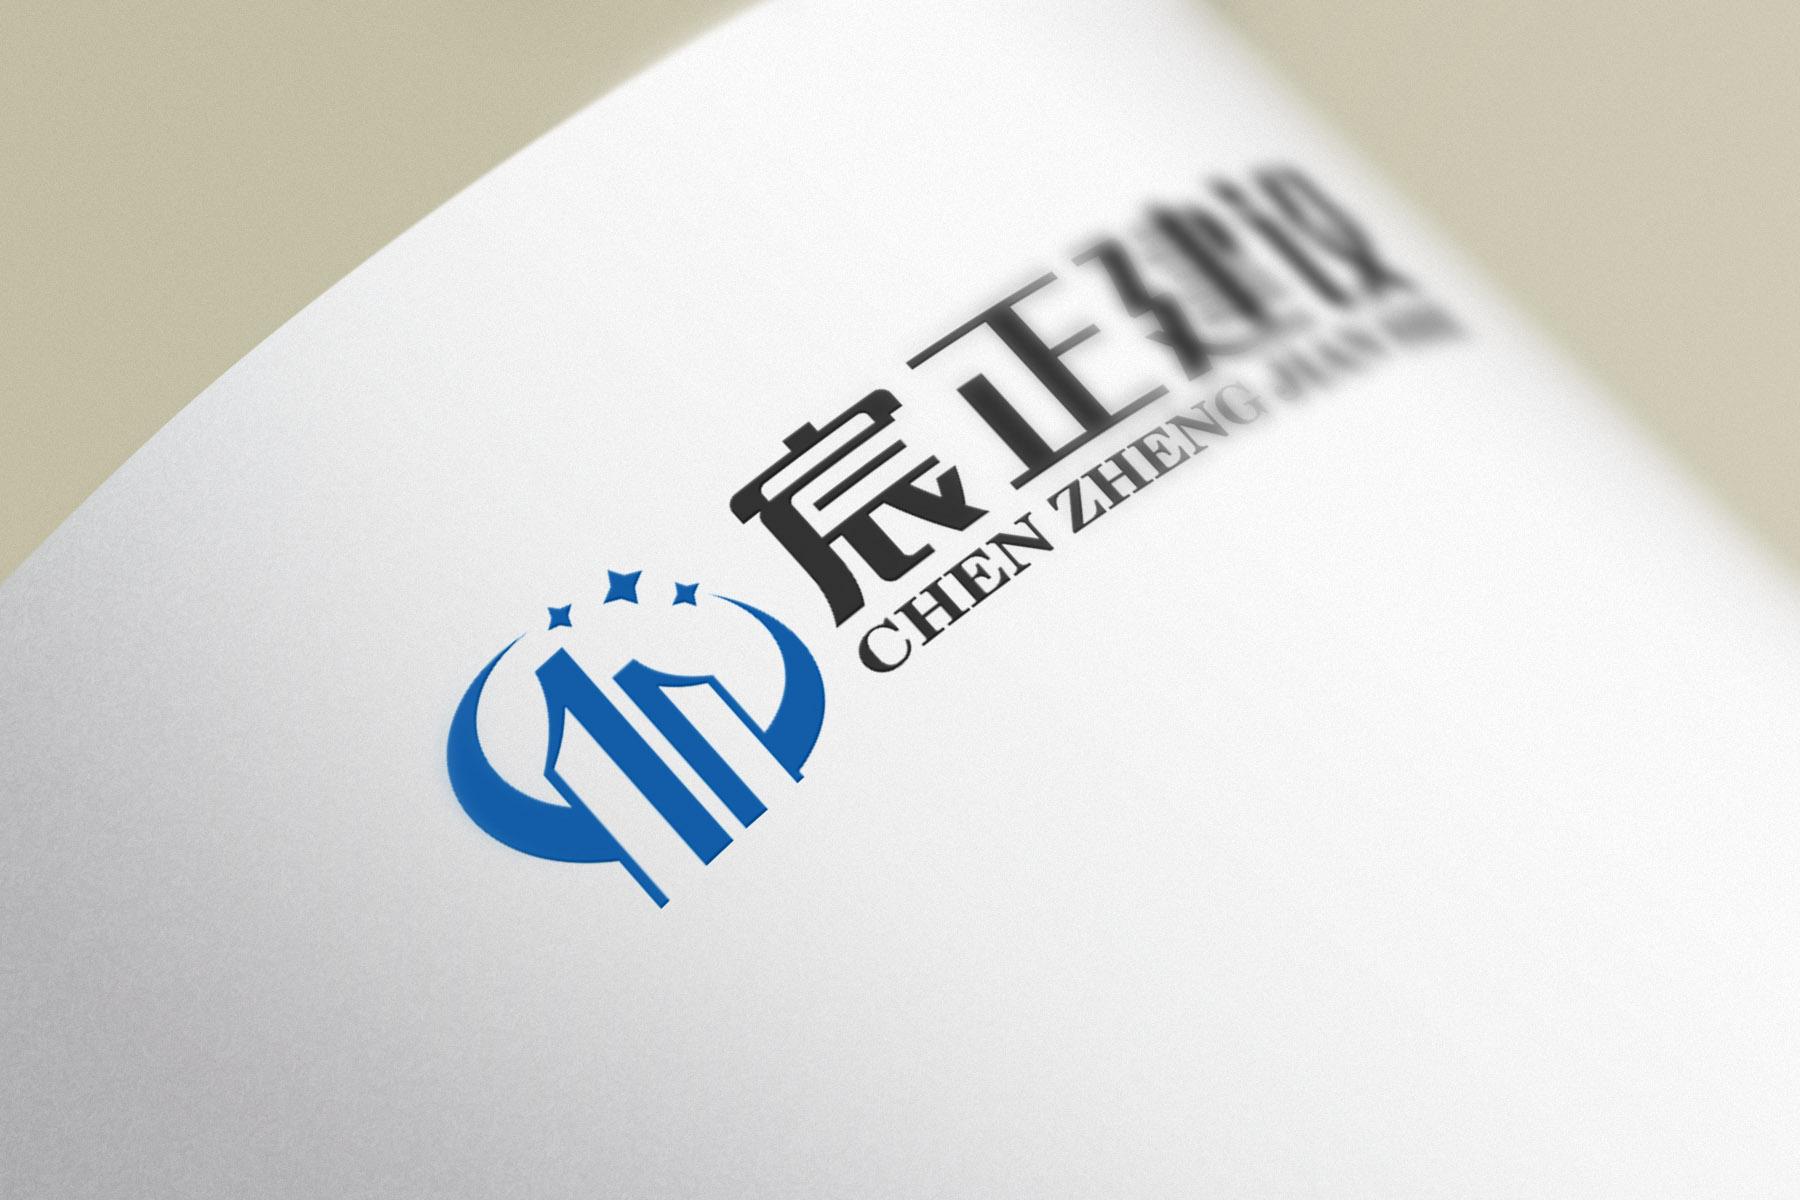 logo设计_3028058_k68威客网